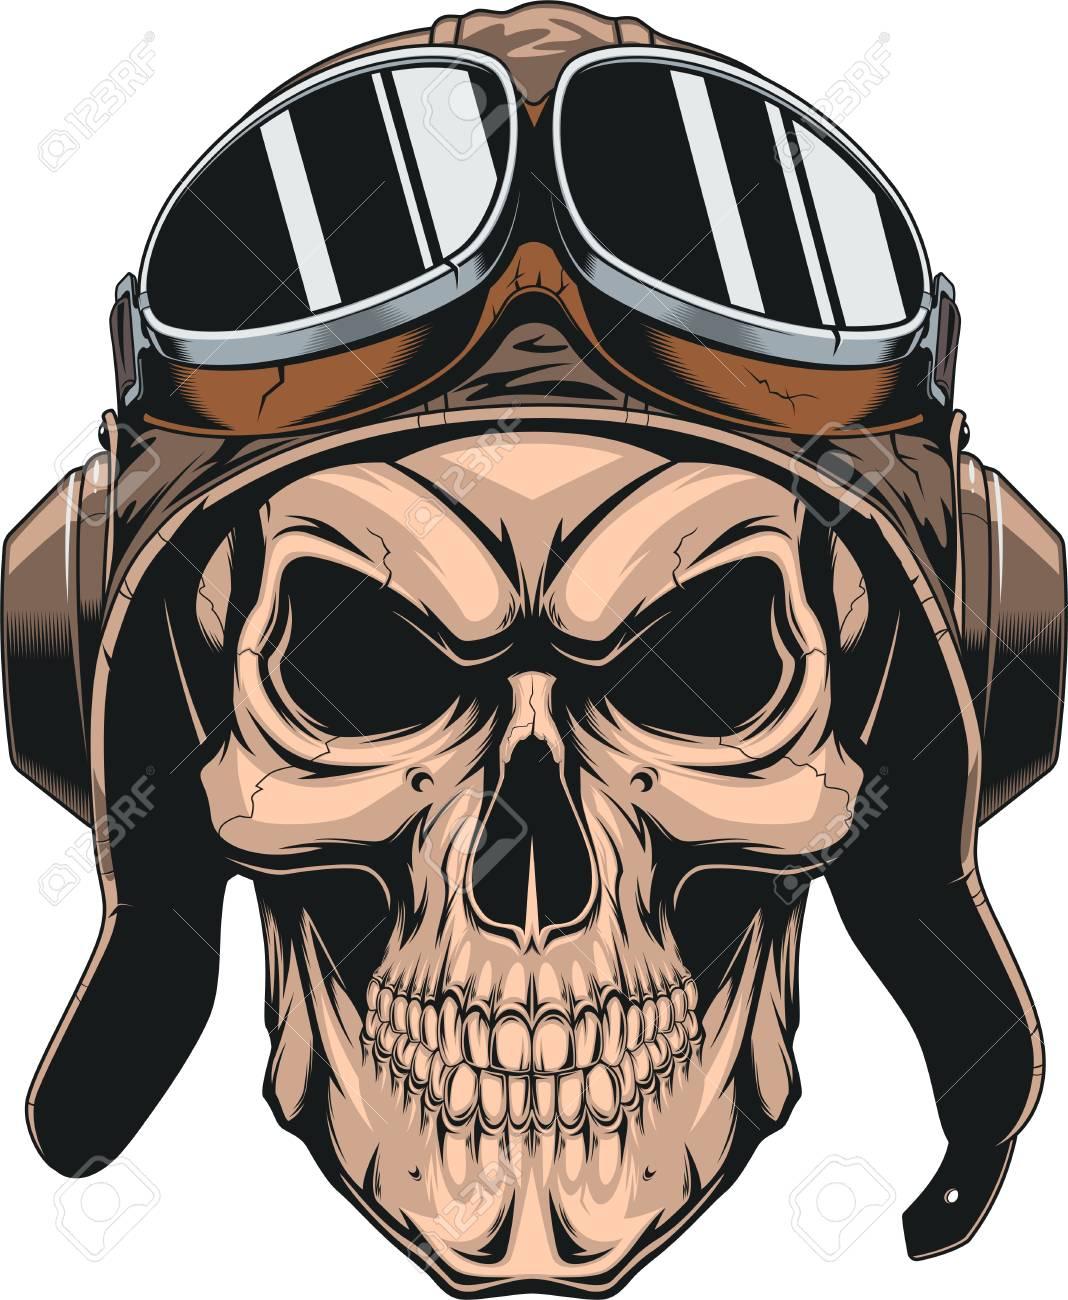 Wicked skull with pilot helmet. - 88503786